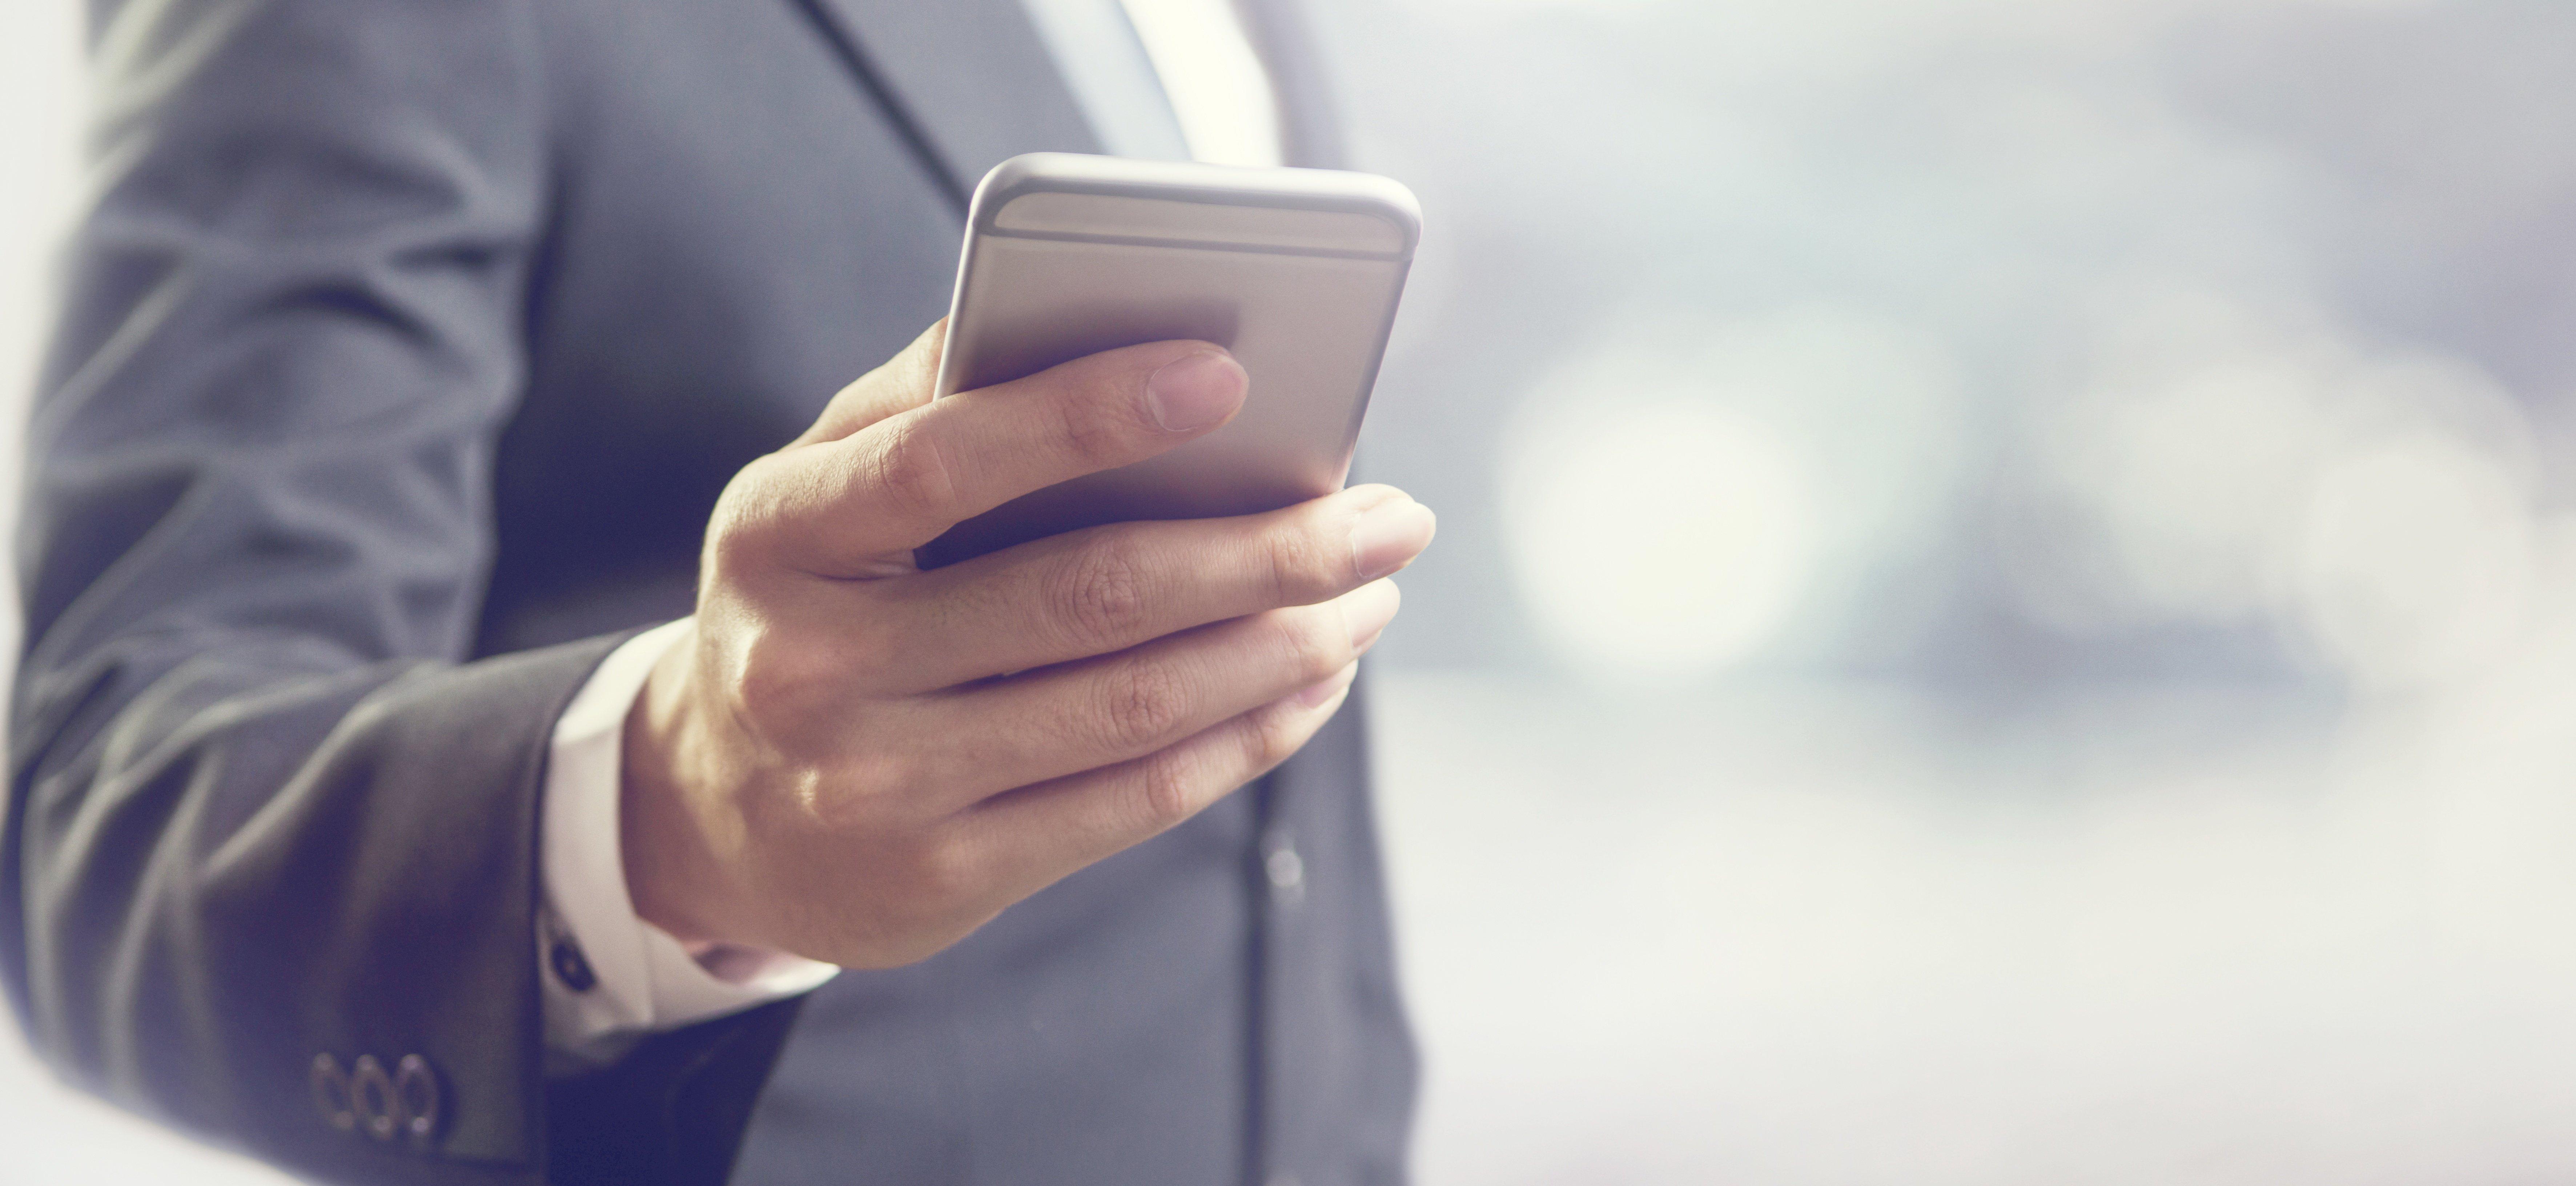 dispositivos-moviles-ciberataques-wifi.jpg